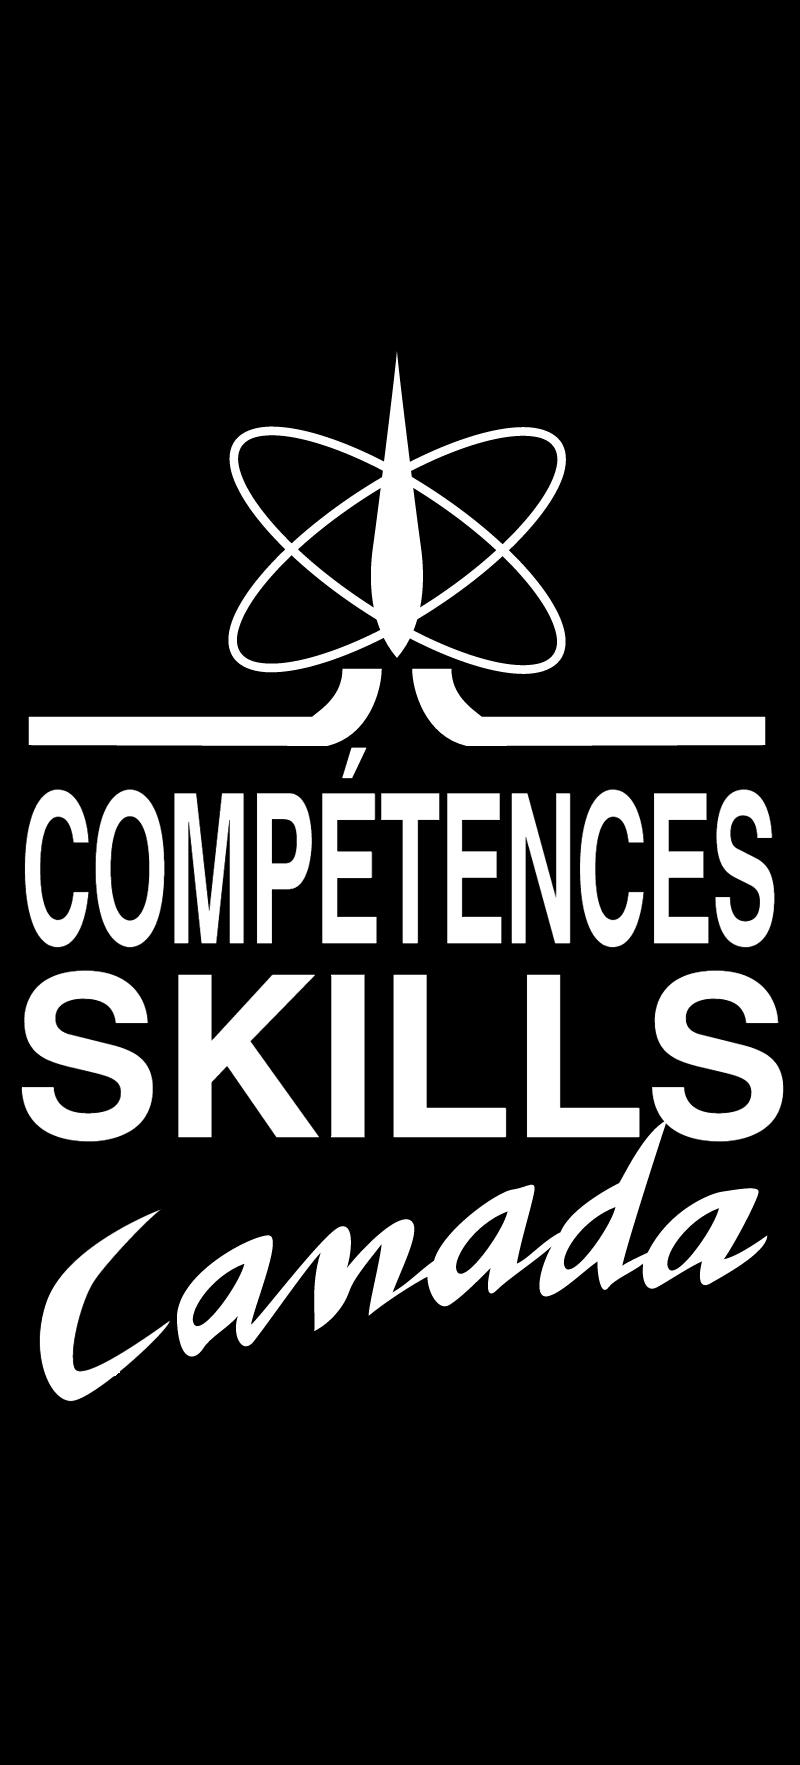 Competence Skills Canada vector